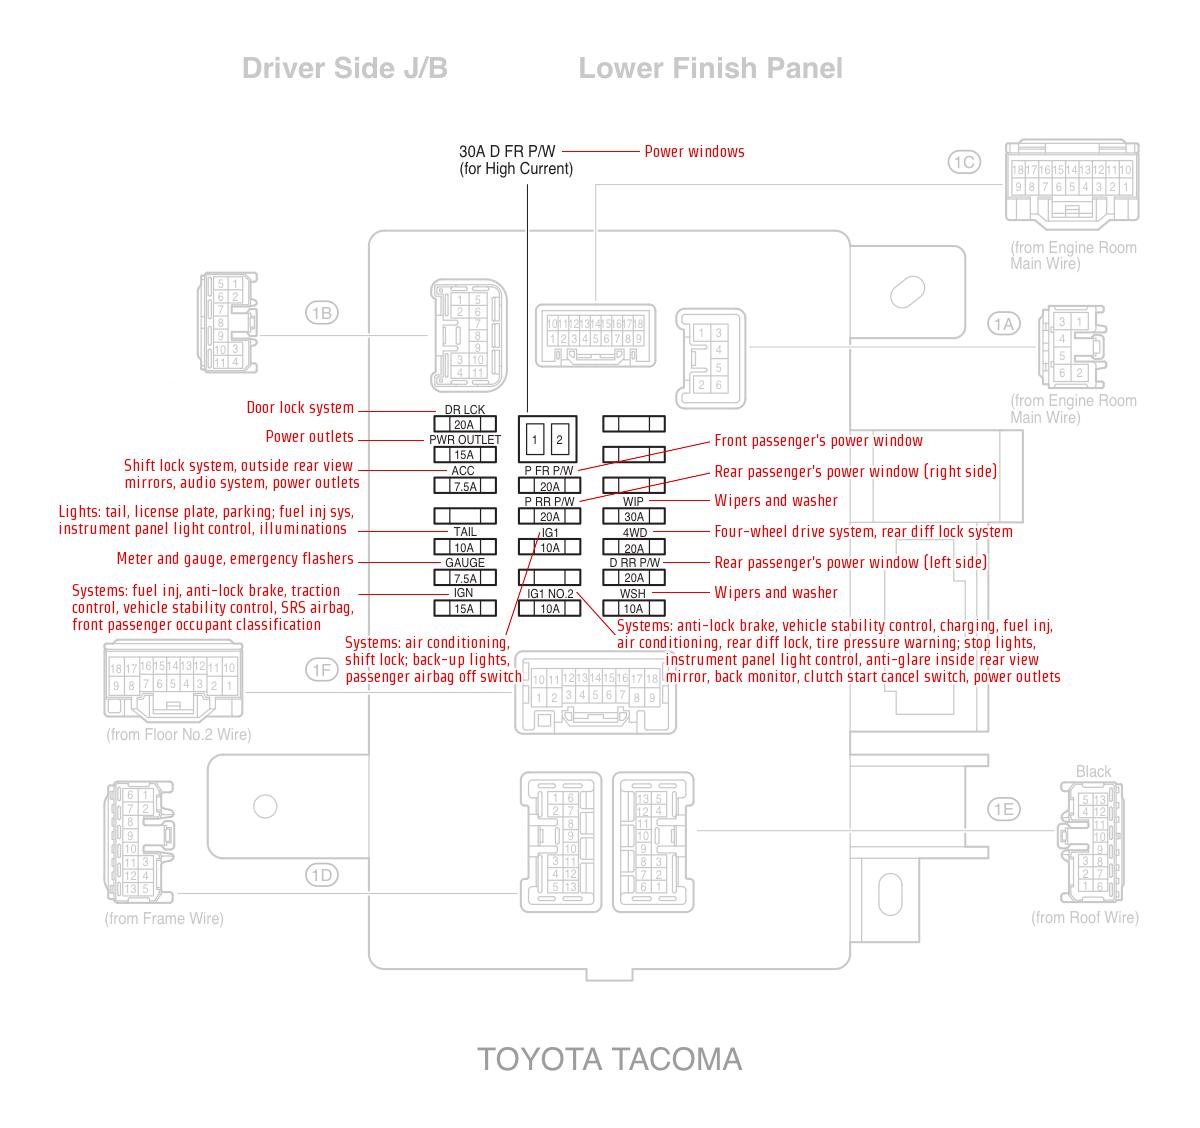 2010 Tundra Fuse Box Diagram Wiring Library Trailer